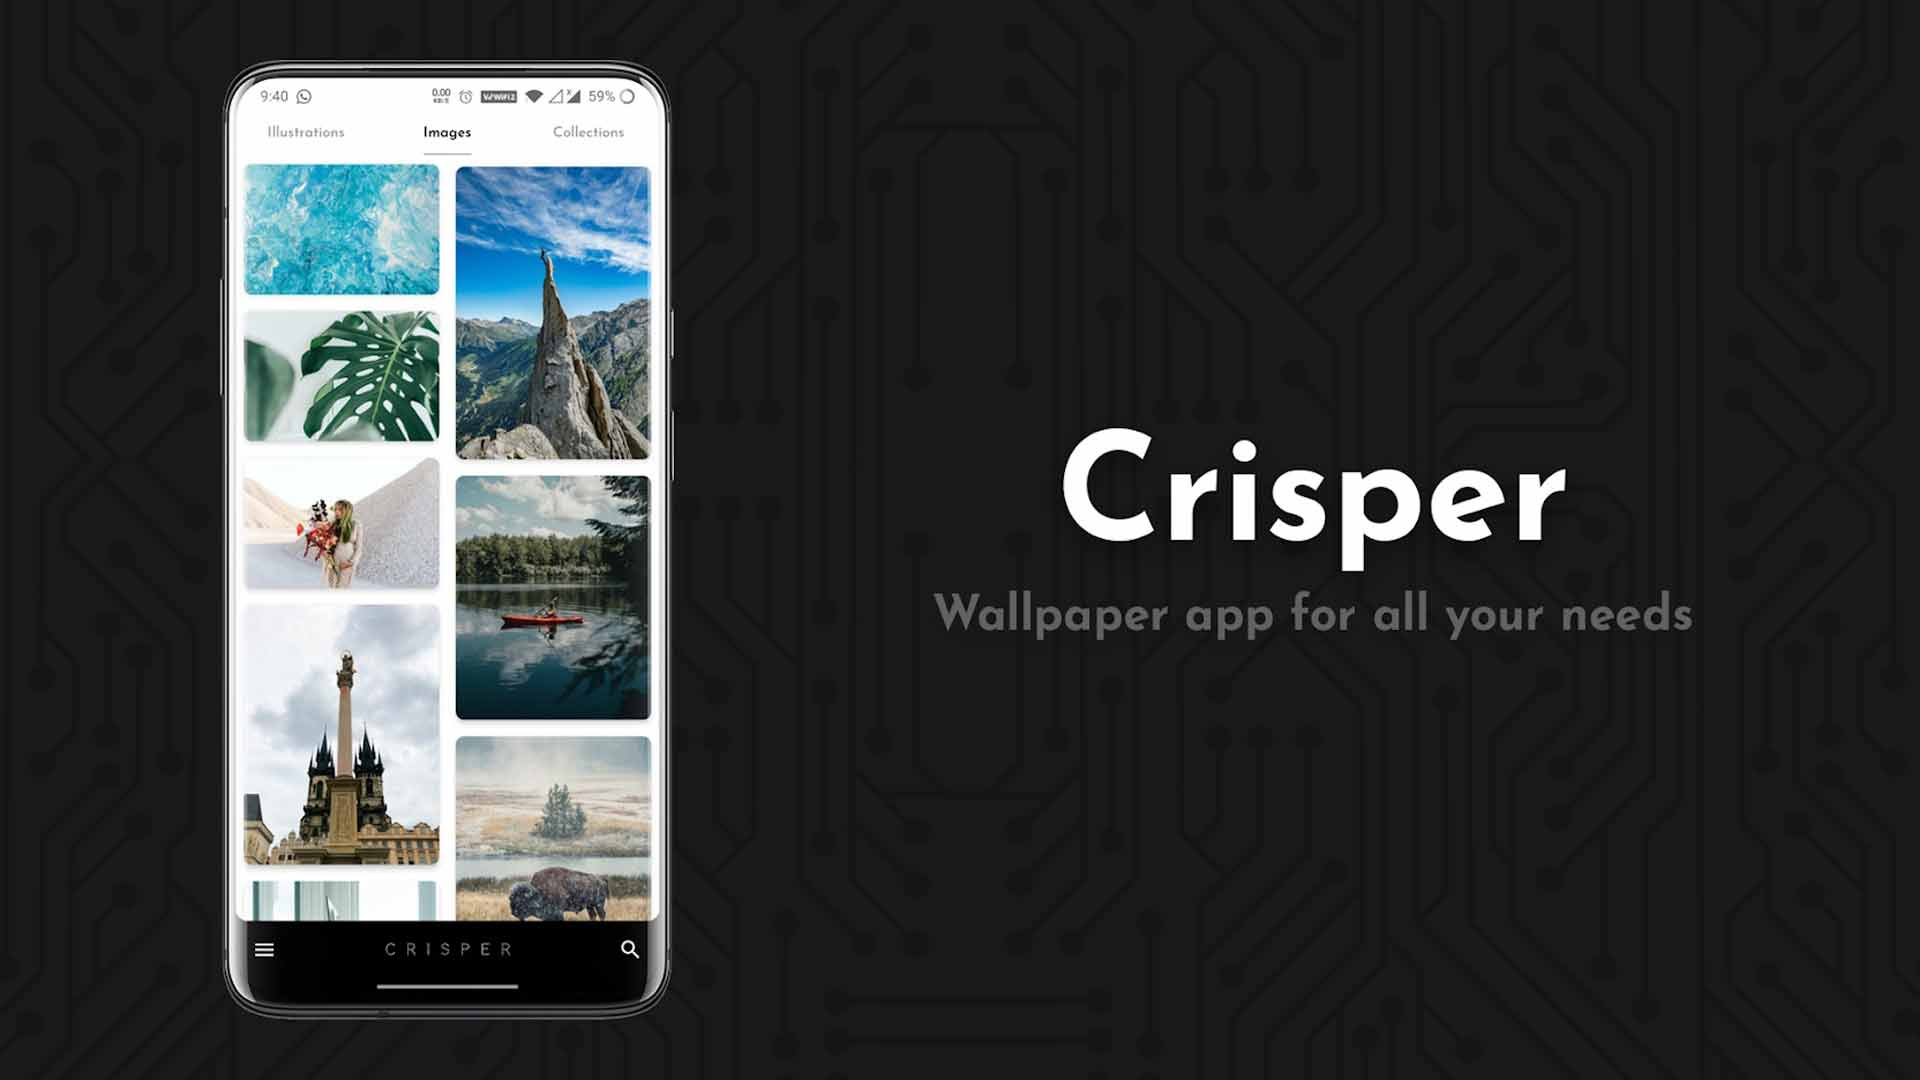 اپلیکیشن Crisper